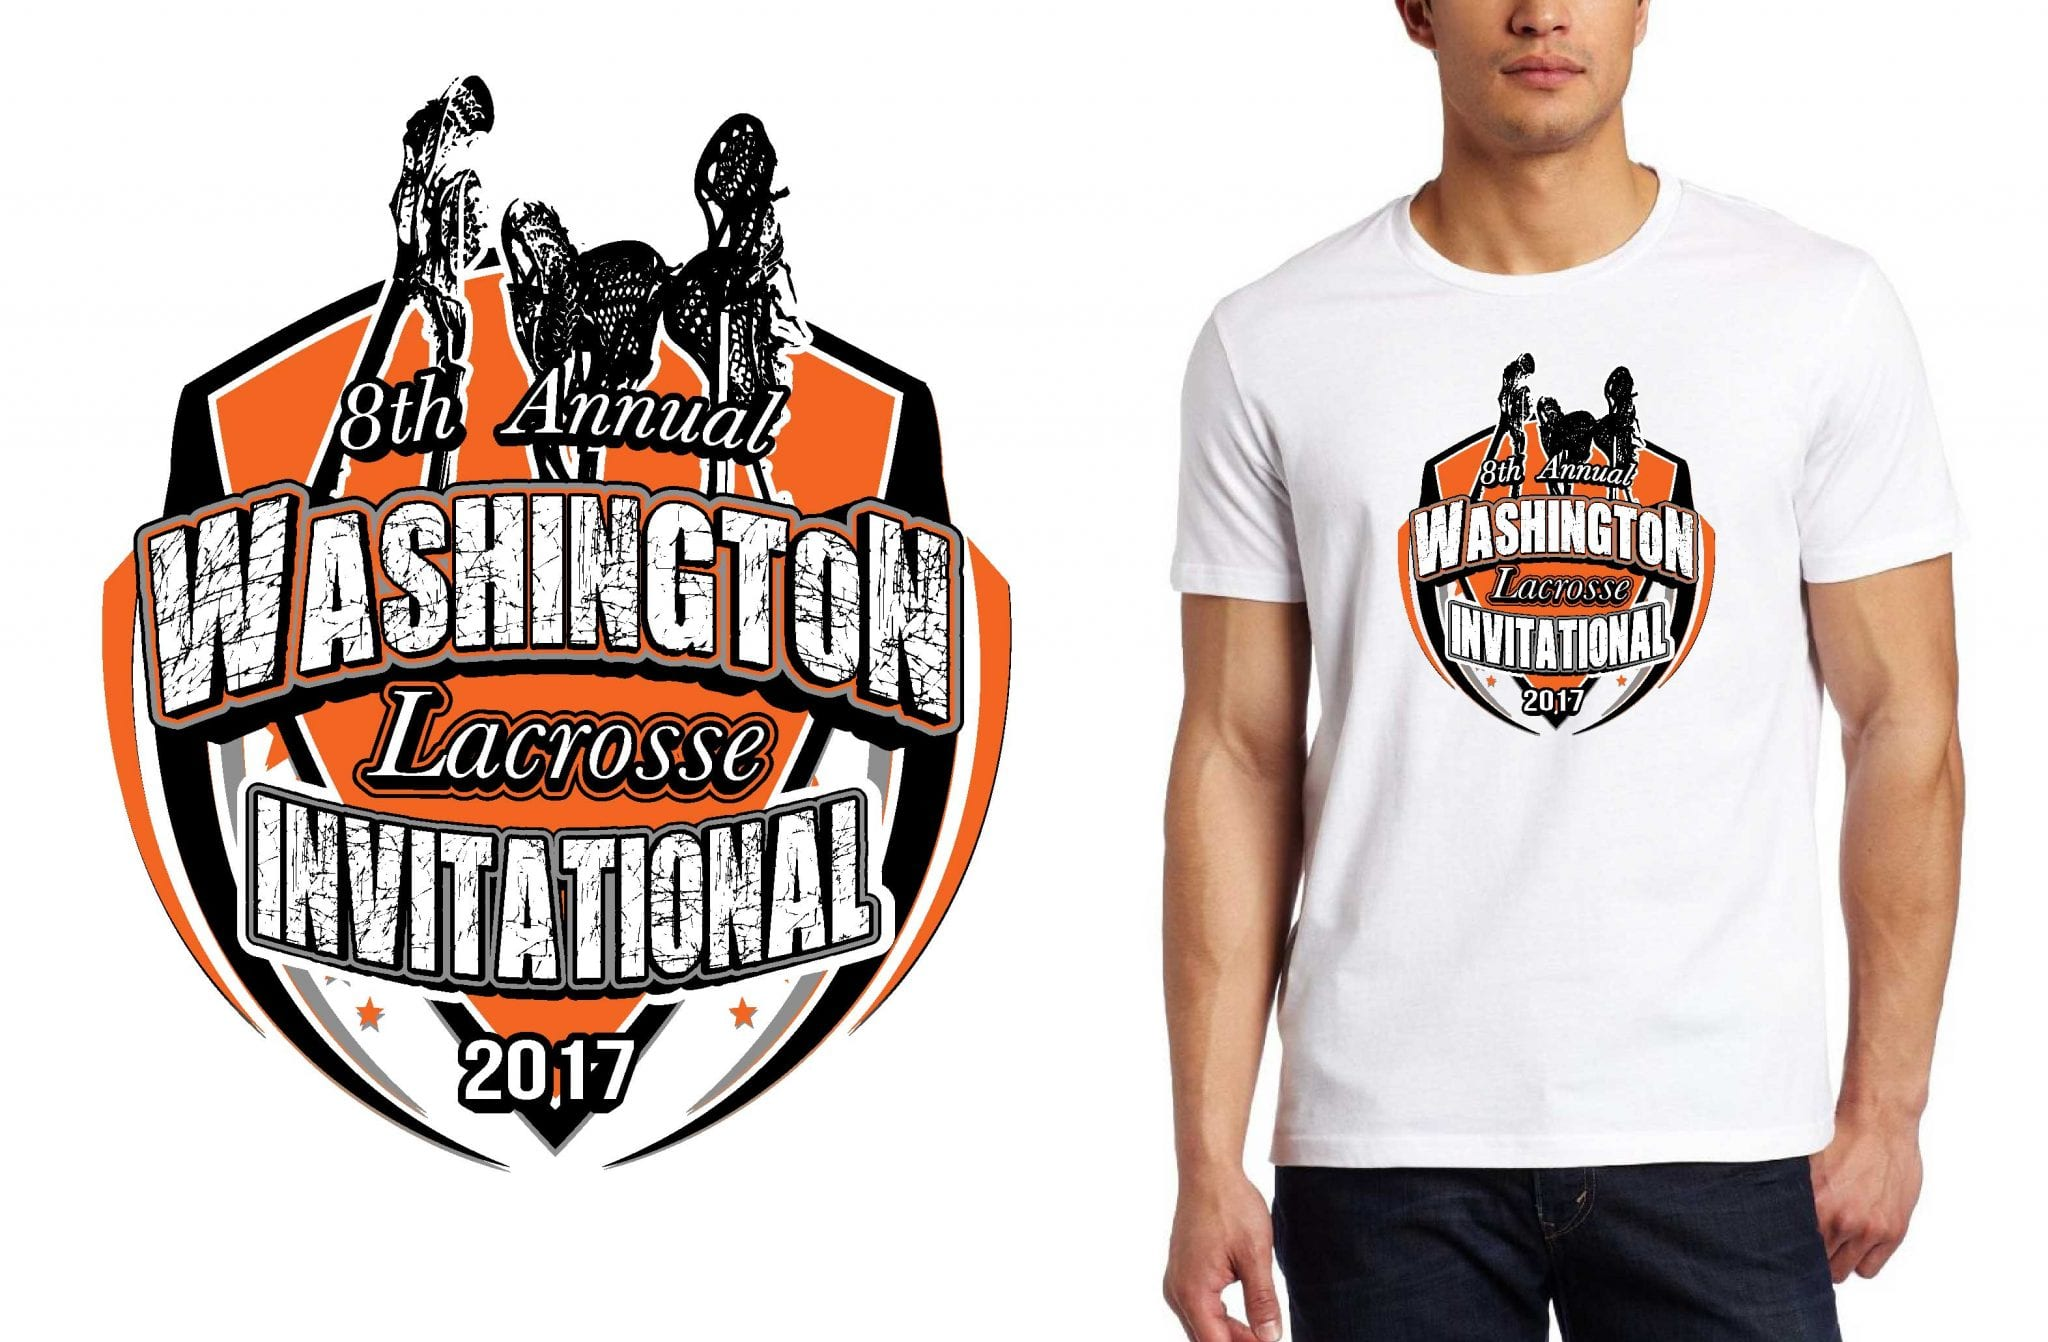 LACROSSE LOGO for 8th-Annual-Washington-Lacrosse-Invitational T-SHIRT UrArtStudio